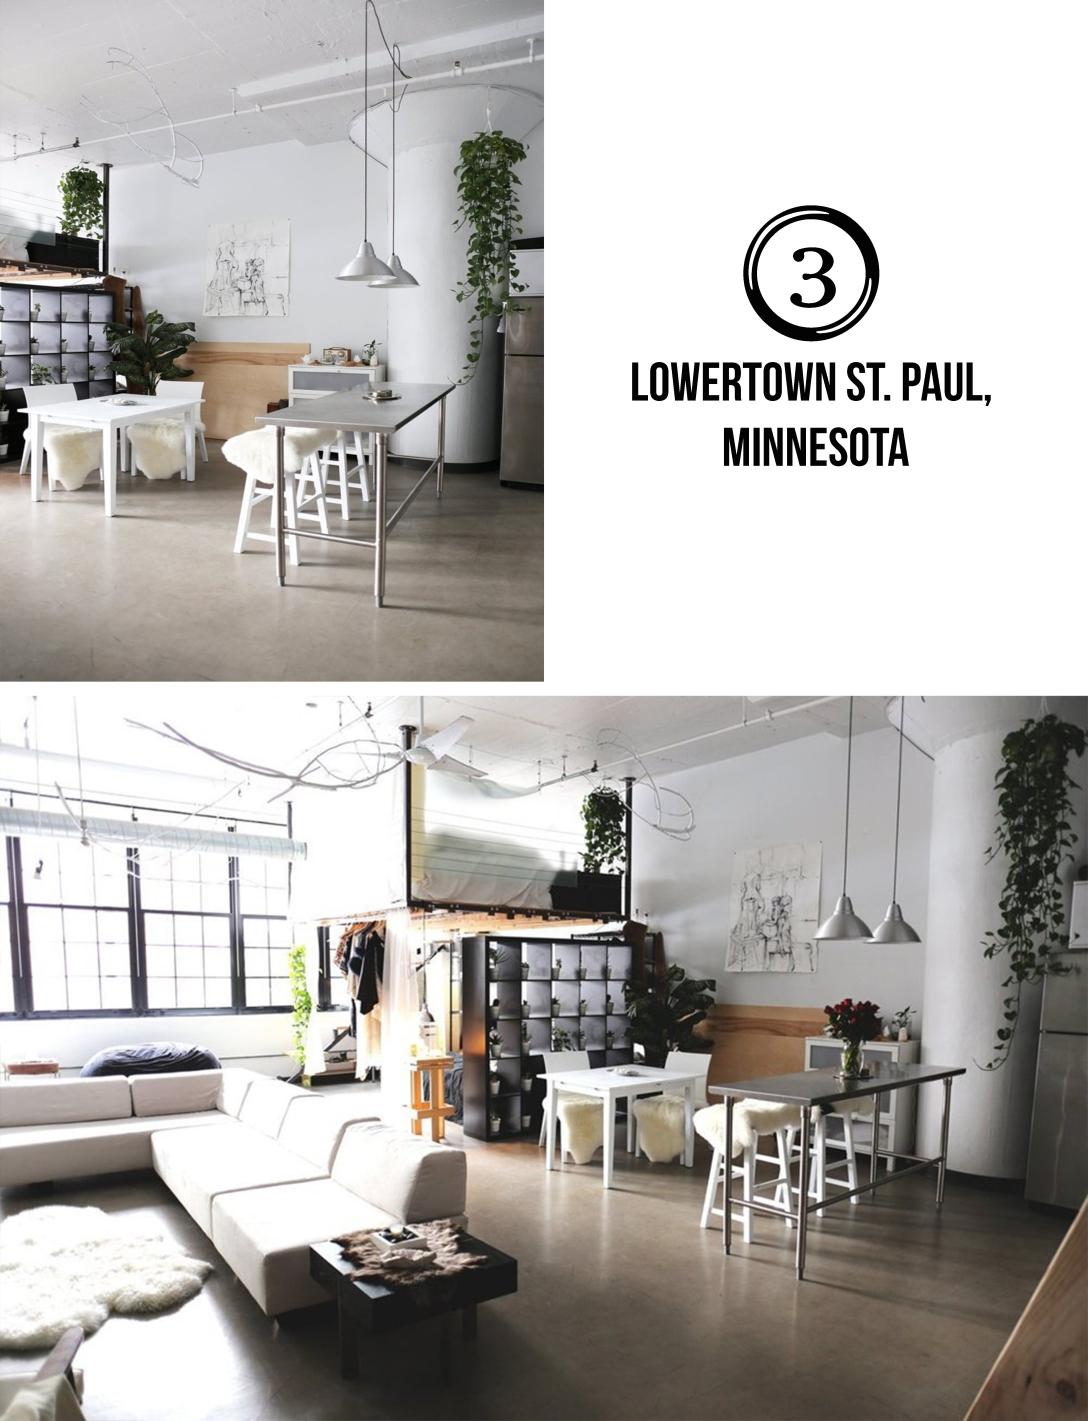 Lowertown St. Paul, Minnesota